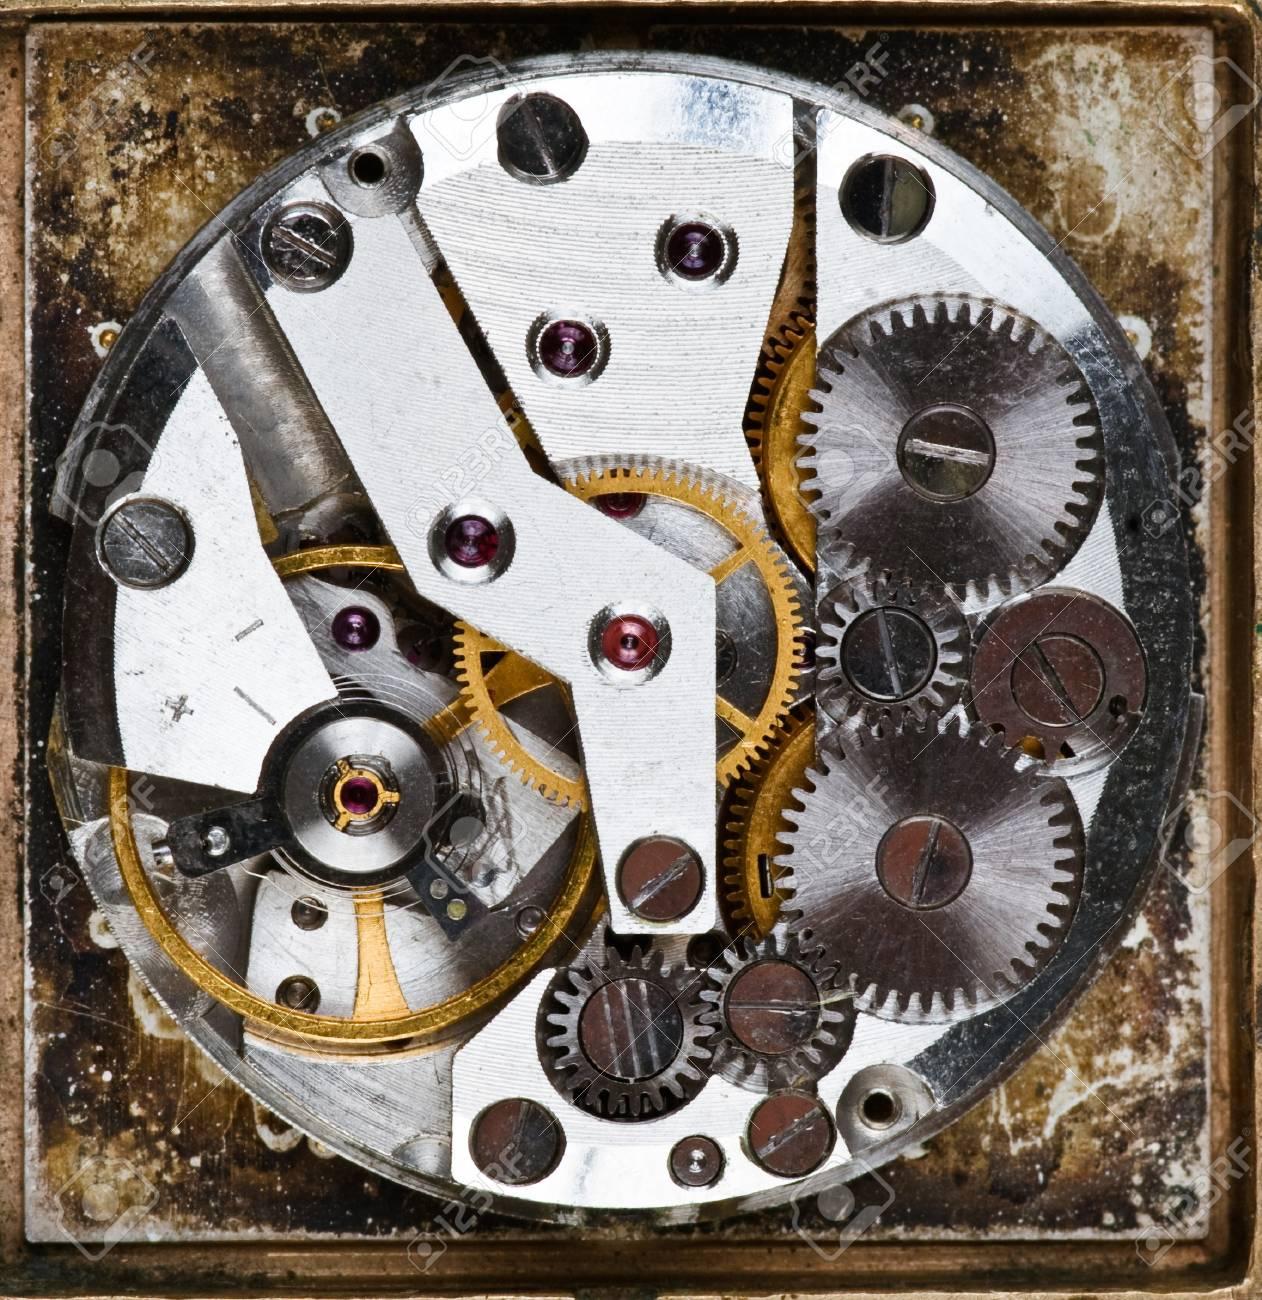 Old grungy wristwatch clockwork Stock Photo - 4322325